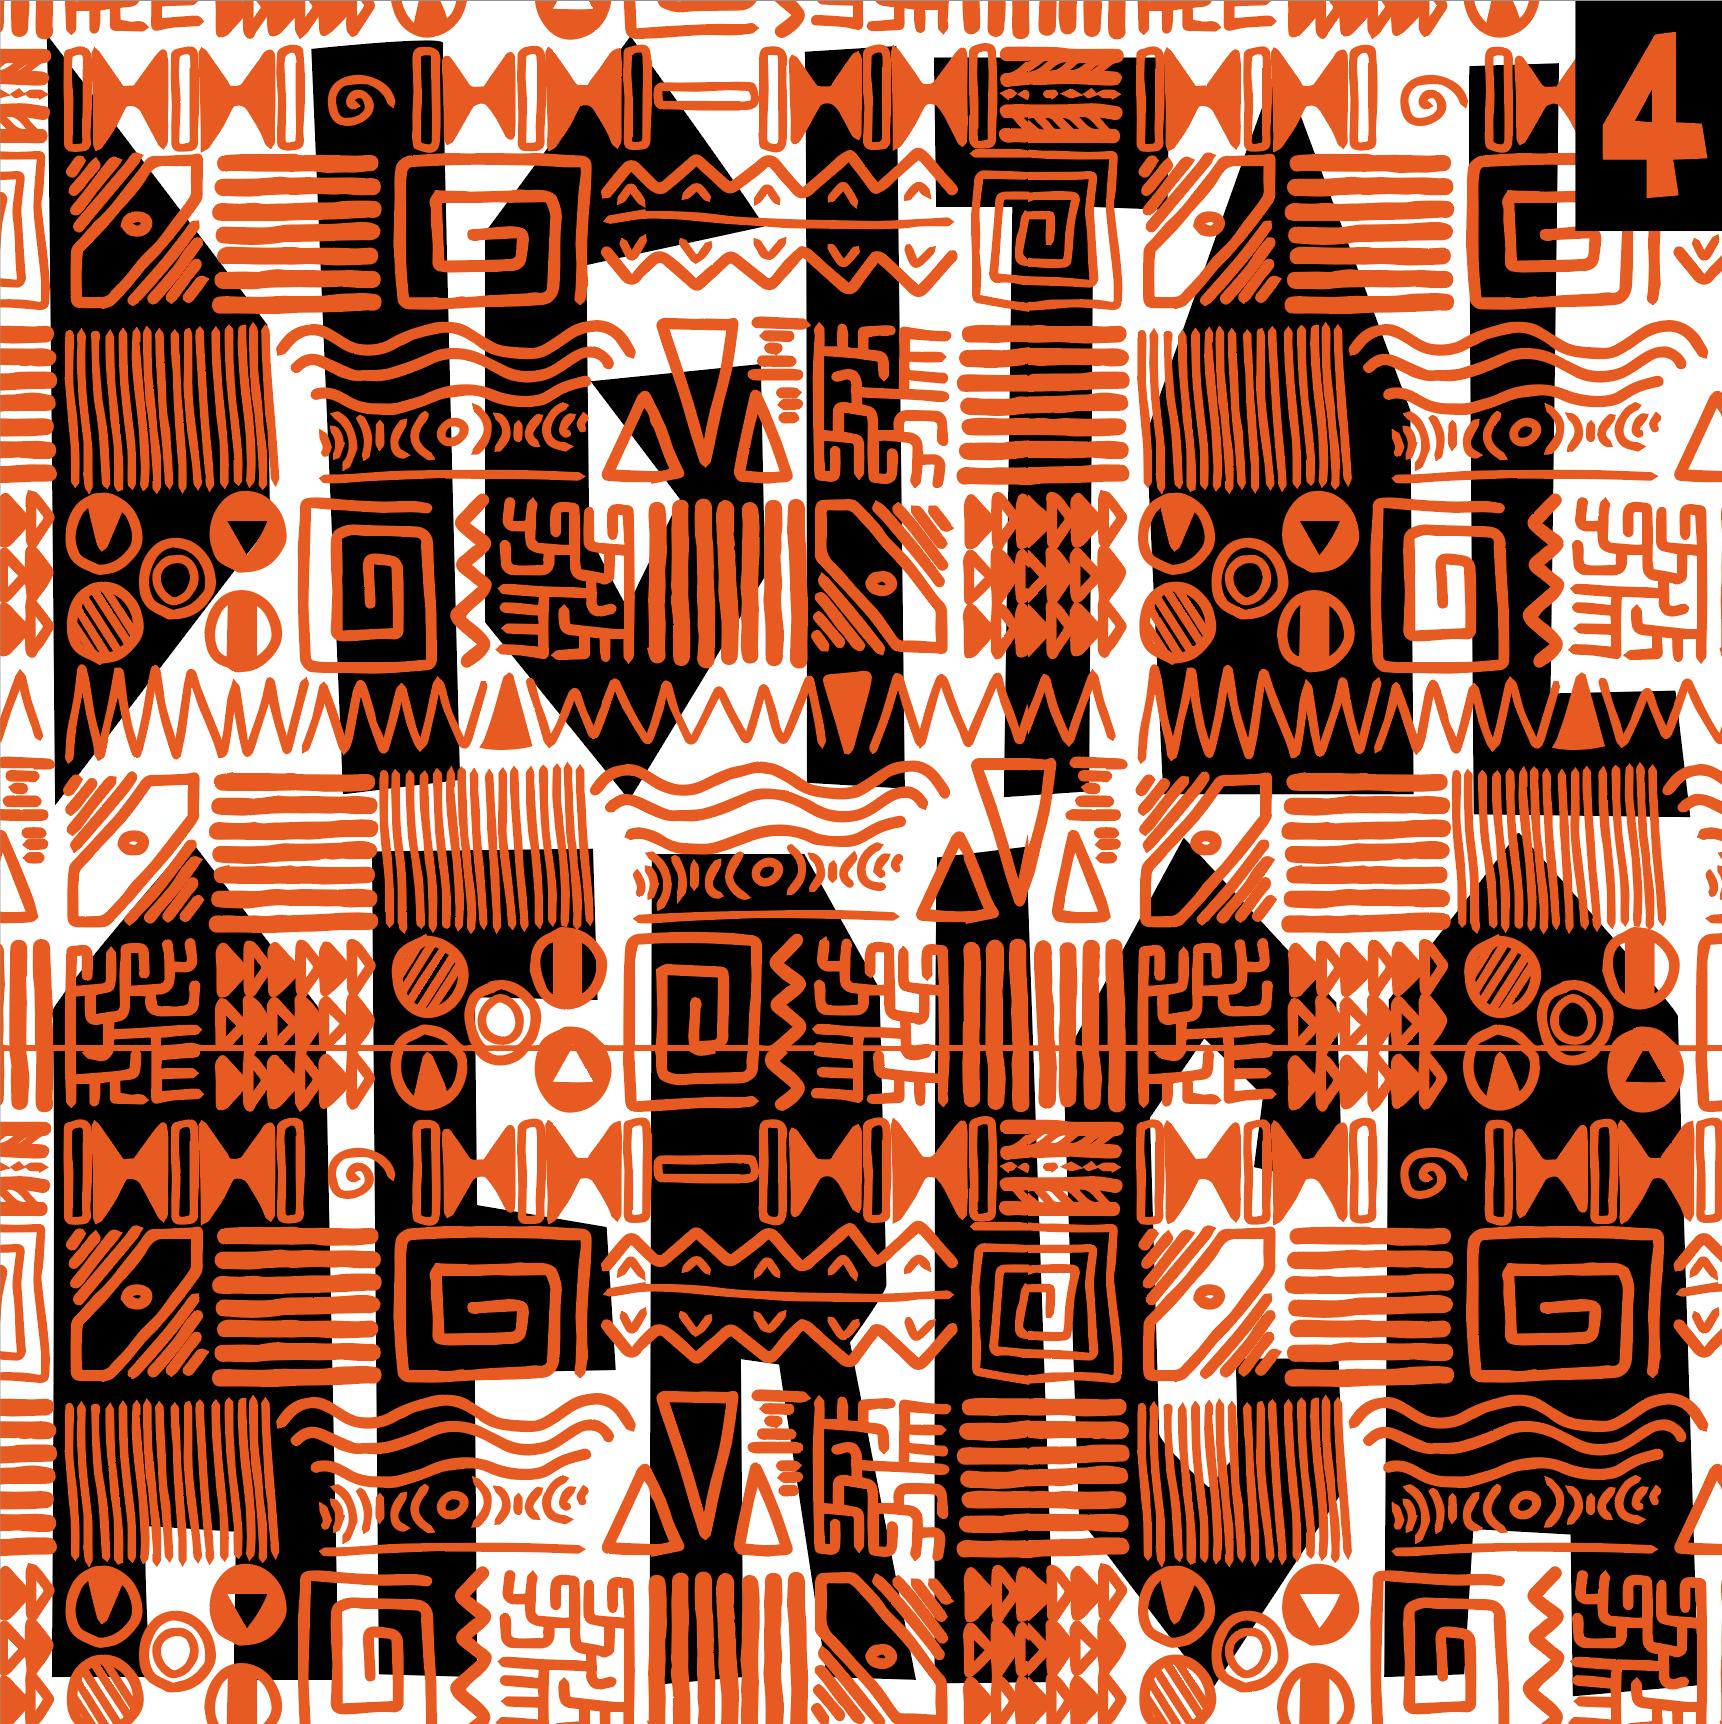 Dj Zhao - Digital Africa 4.png